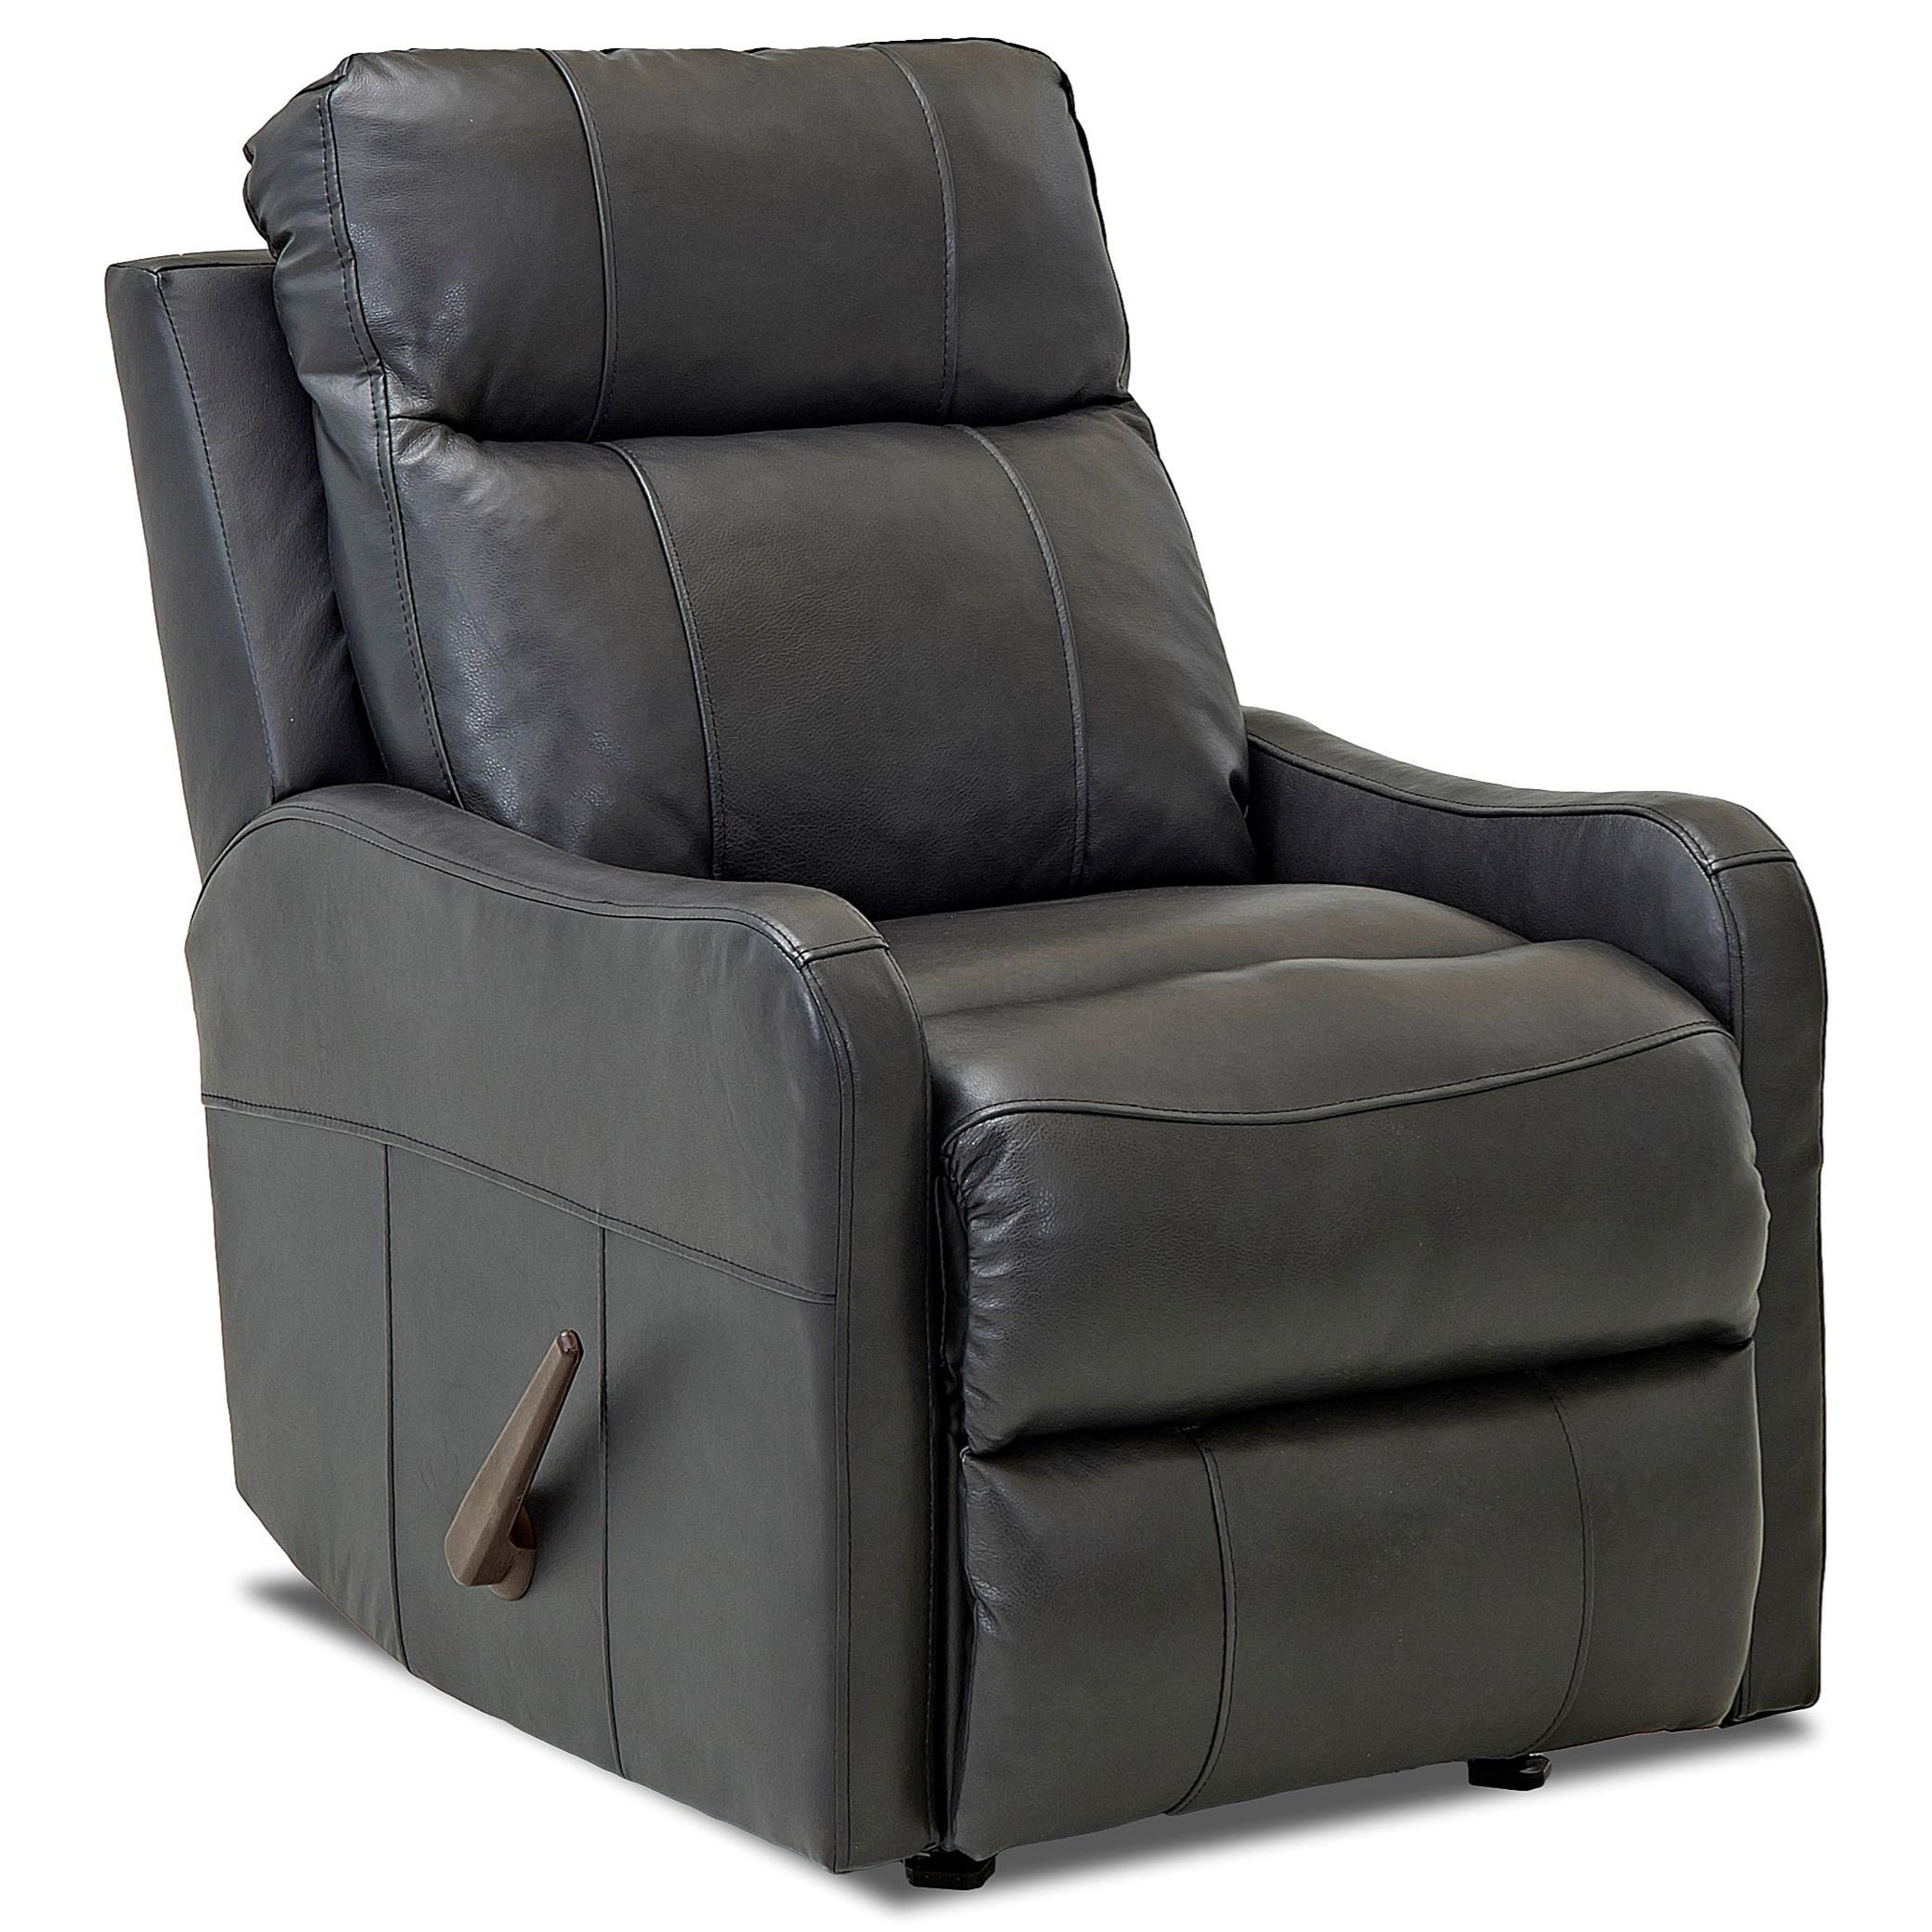 Swivel Rocking Reclining Chair